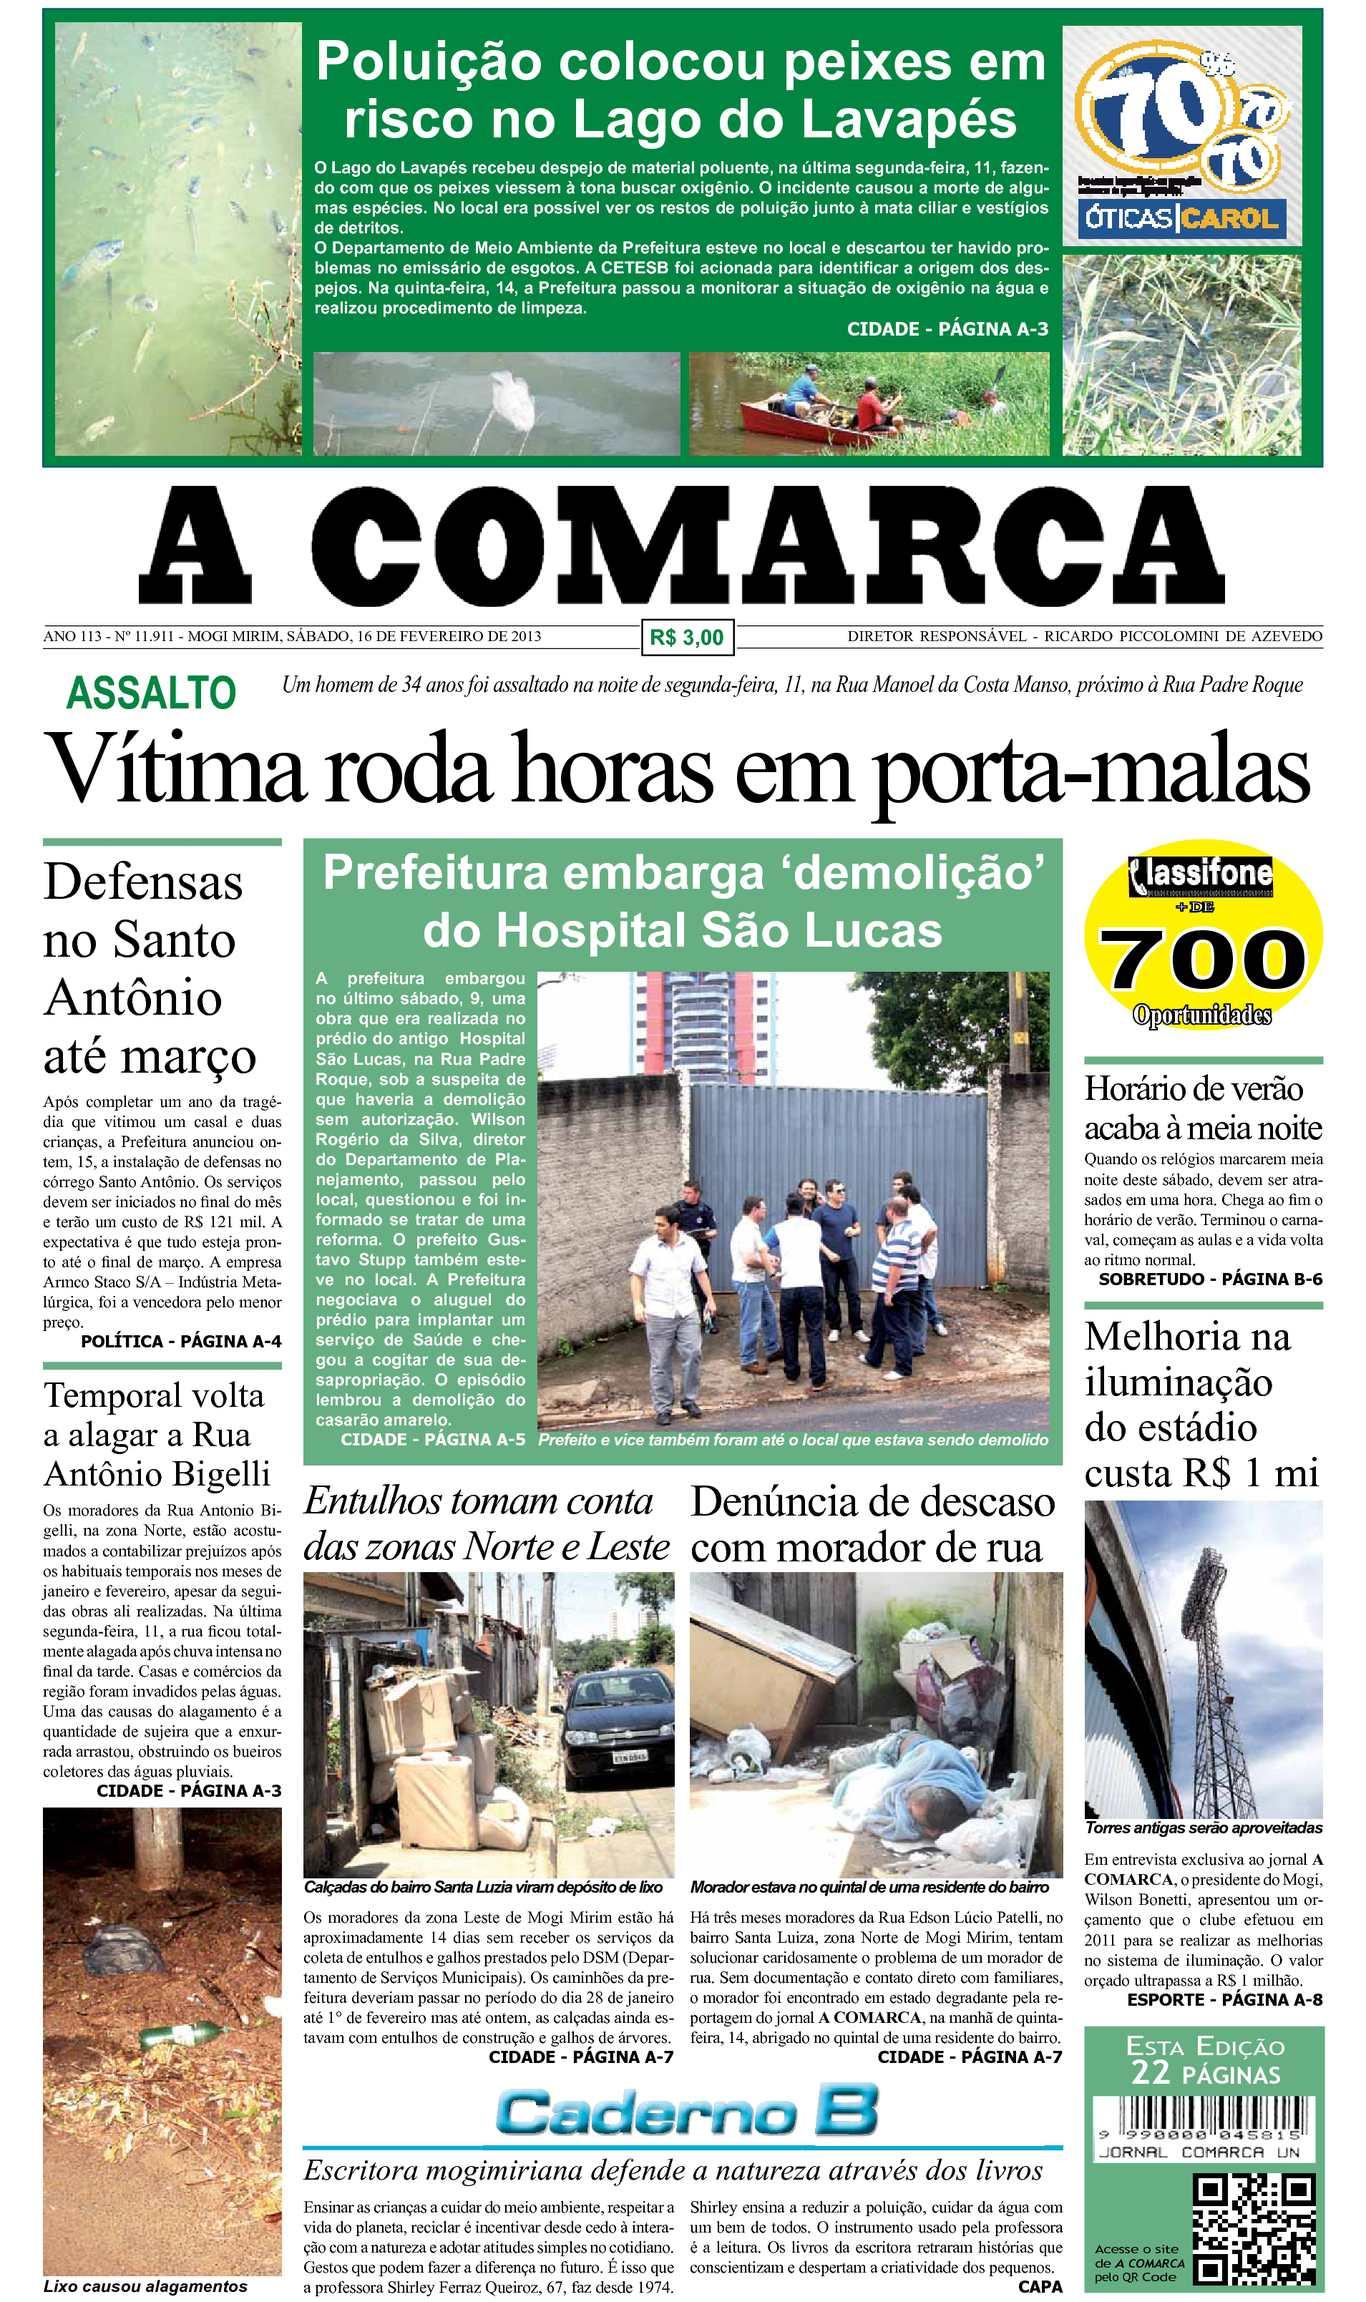 ca262343dde Calaméo - A Comarca